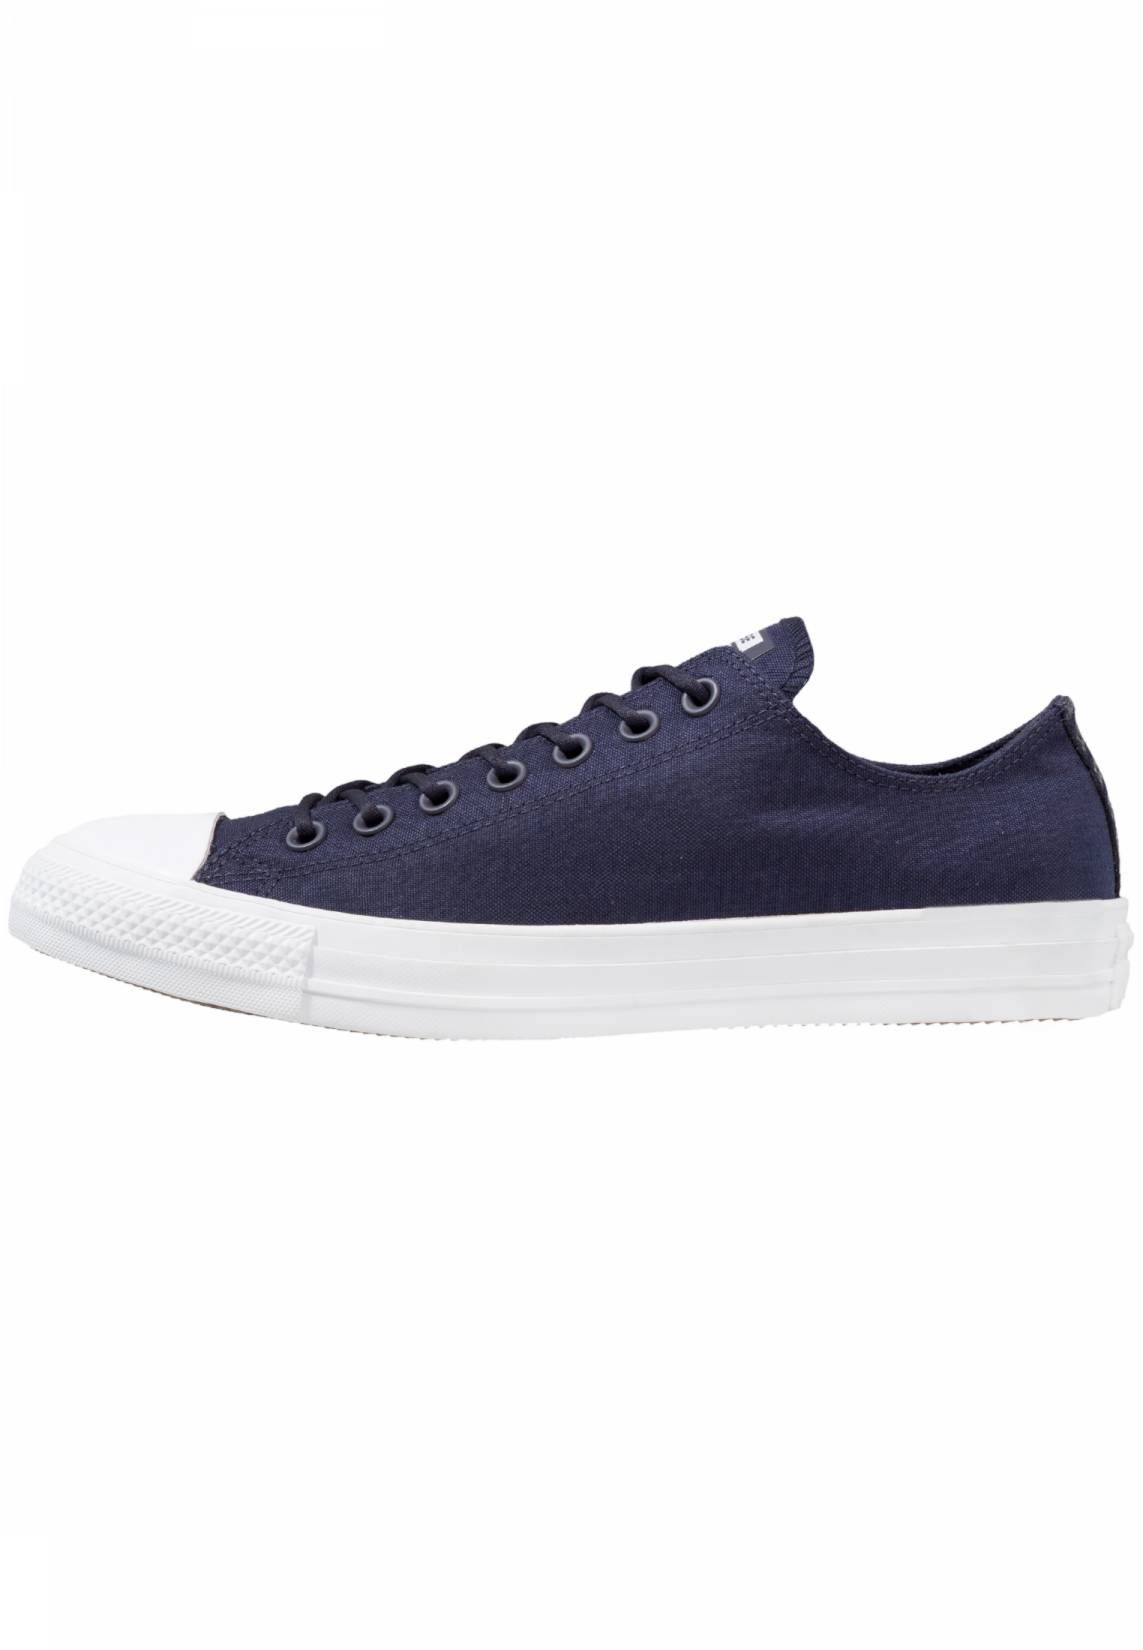 3fb2b6a37 Converse. CHUCK TAYLOR ALL STAR CORDURA - OX - Zapatillas - inked white.